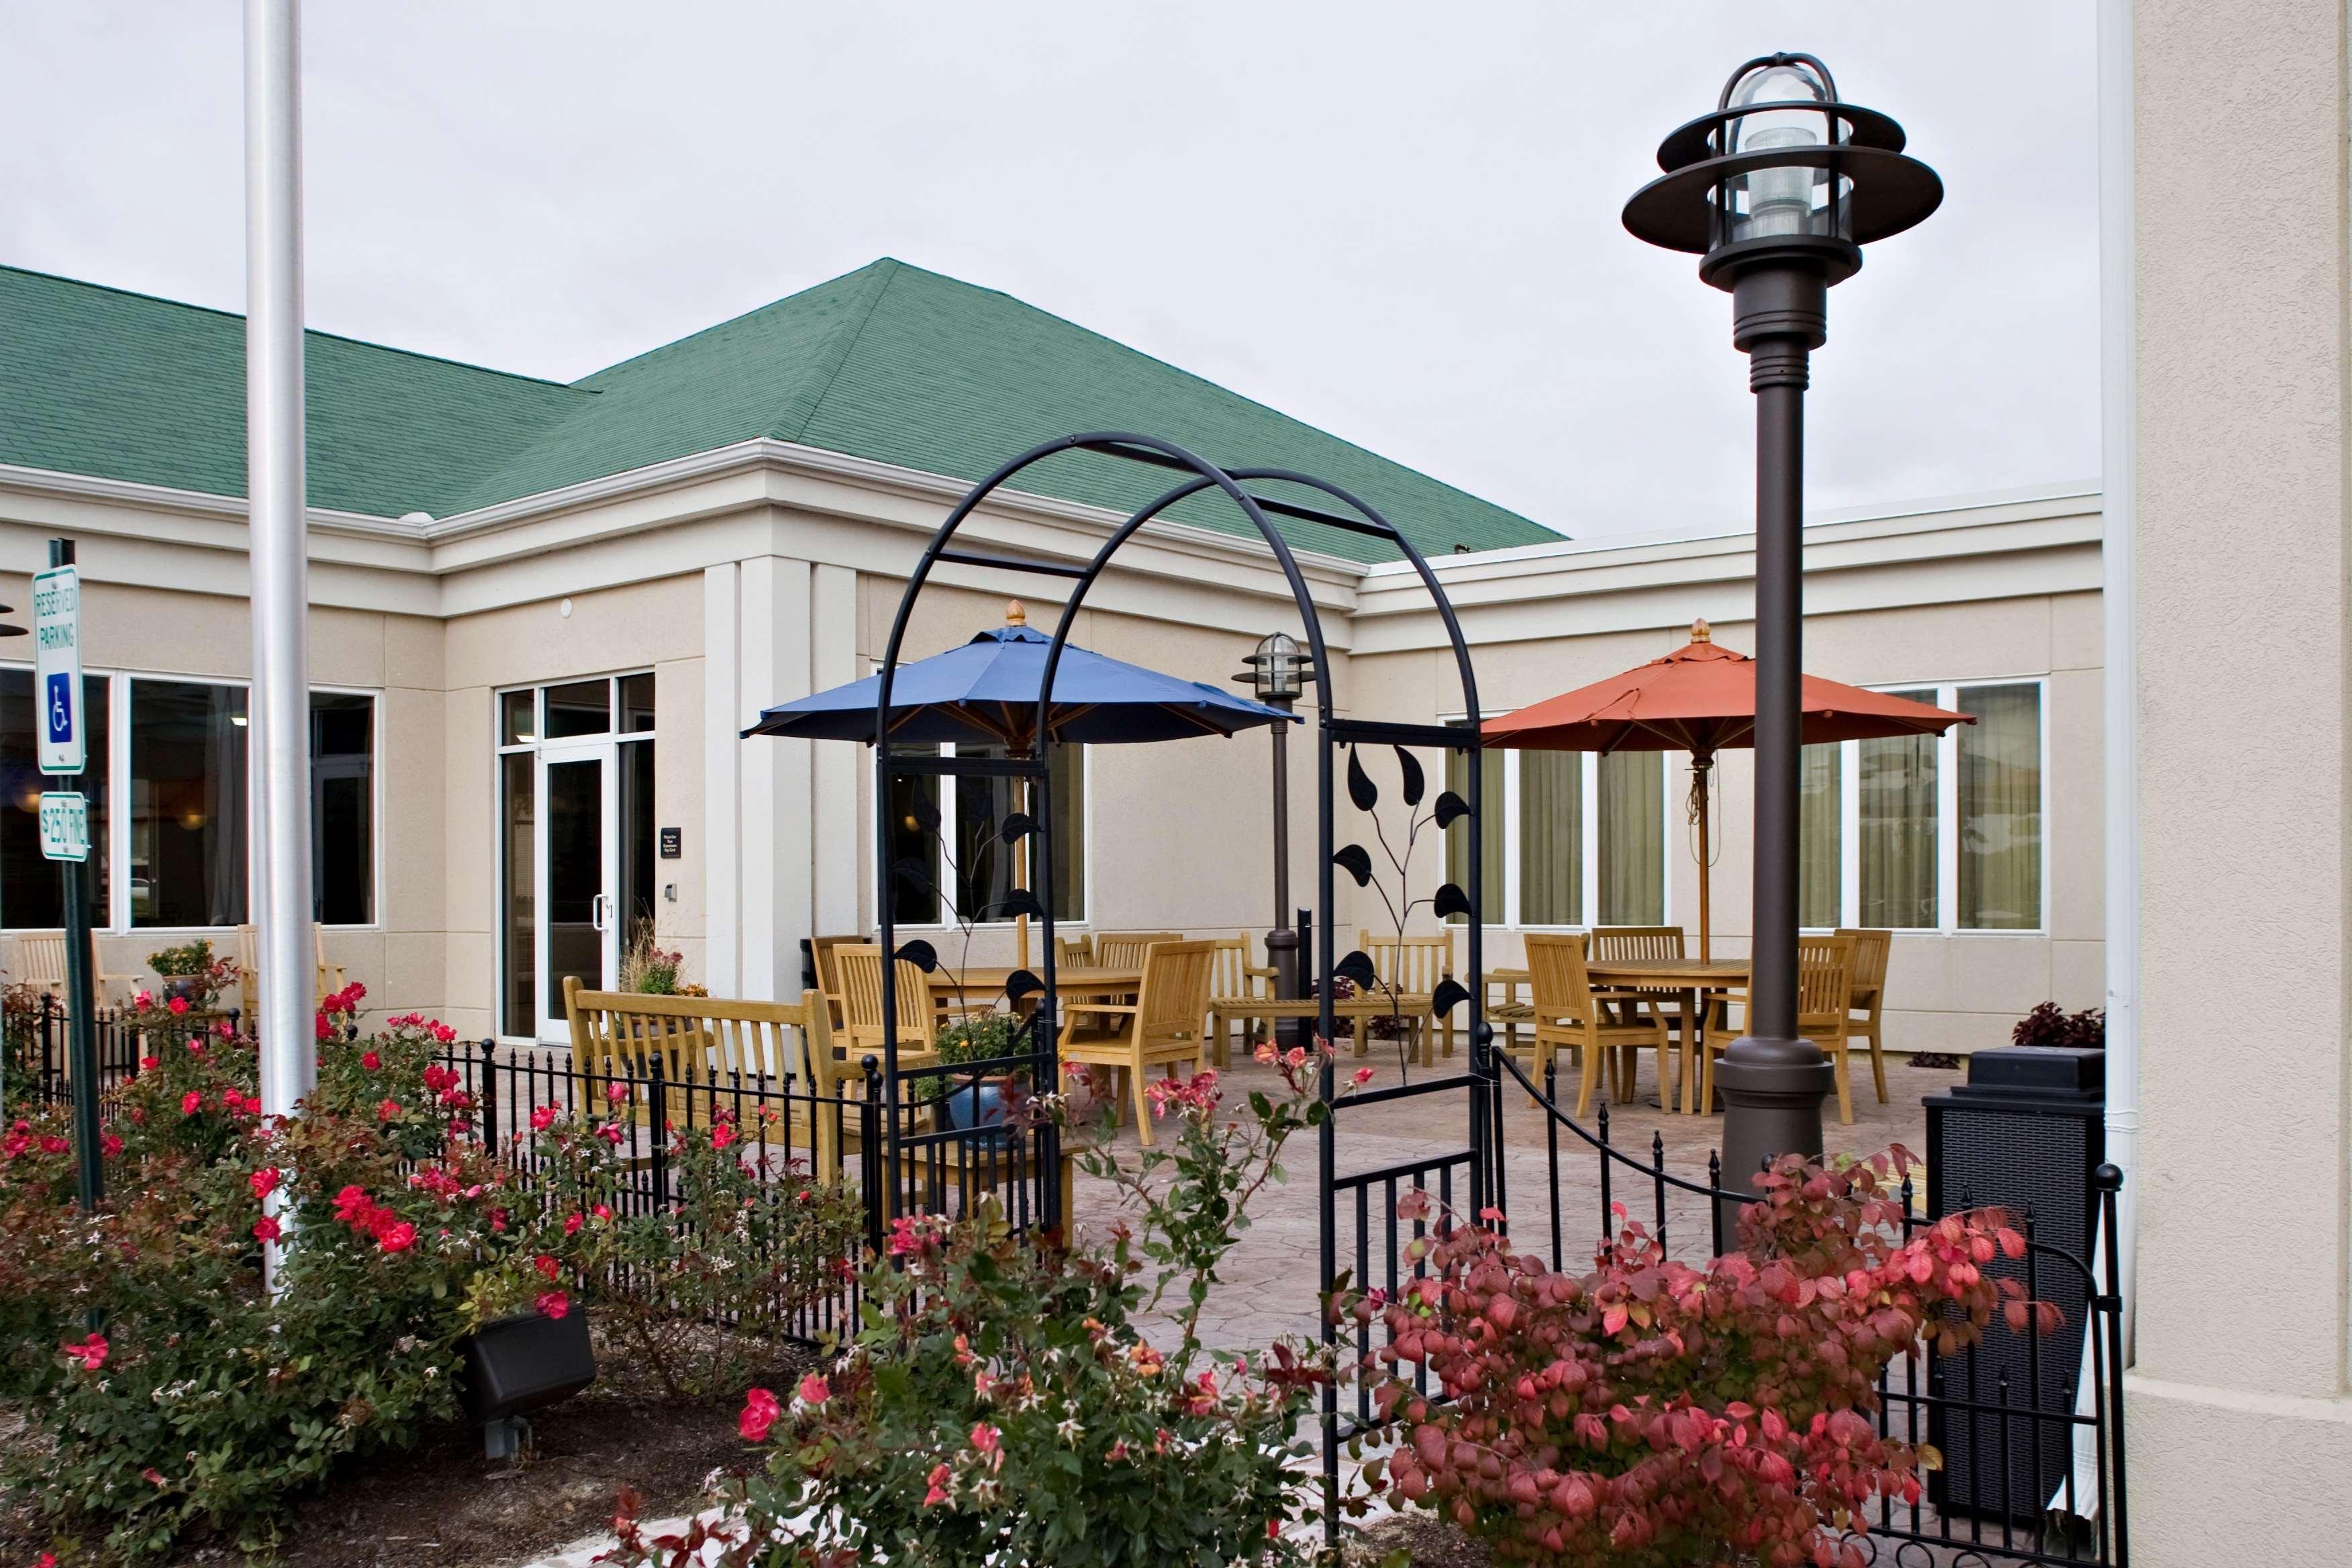 Hilton Garden Inn Champaign/ Urbana image 1